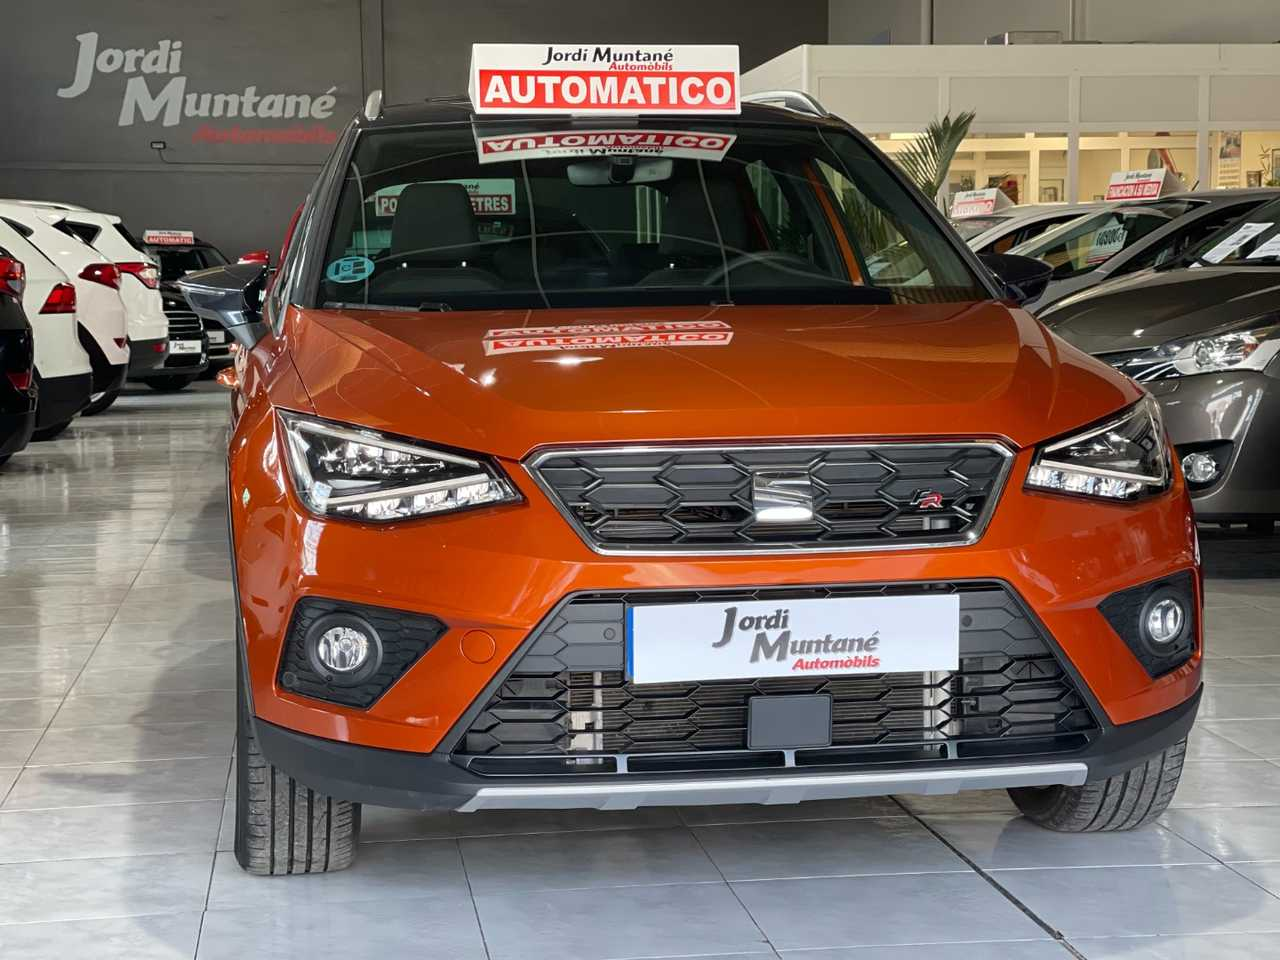 Seat Arona 1.0 TSI 115cv DSG7 FR ECOMOTIVE S/S -. '' FULL EQUIP + Cambio Automático DSG 7 '' .-